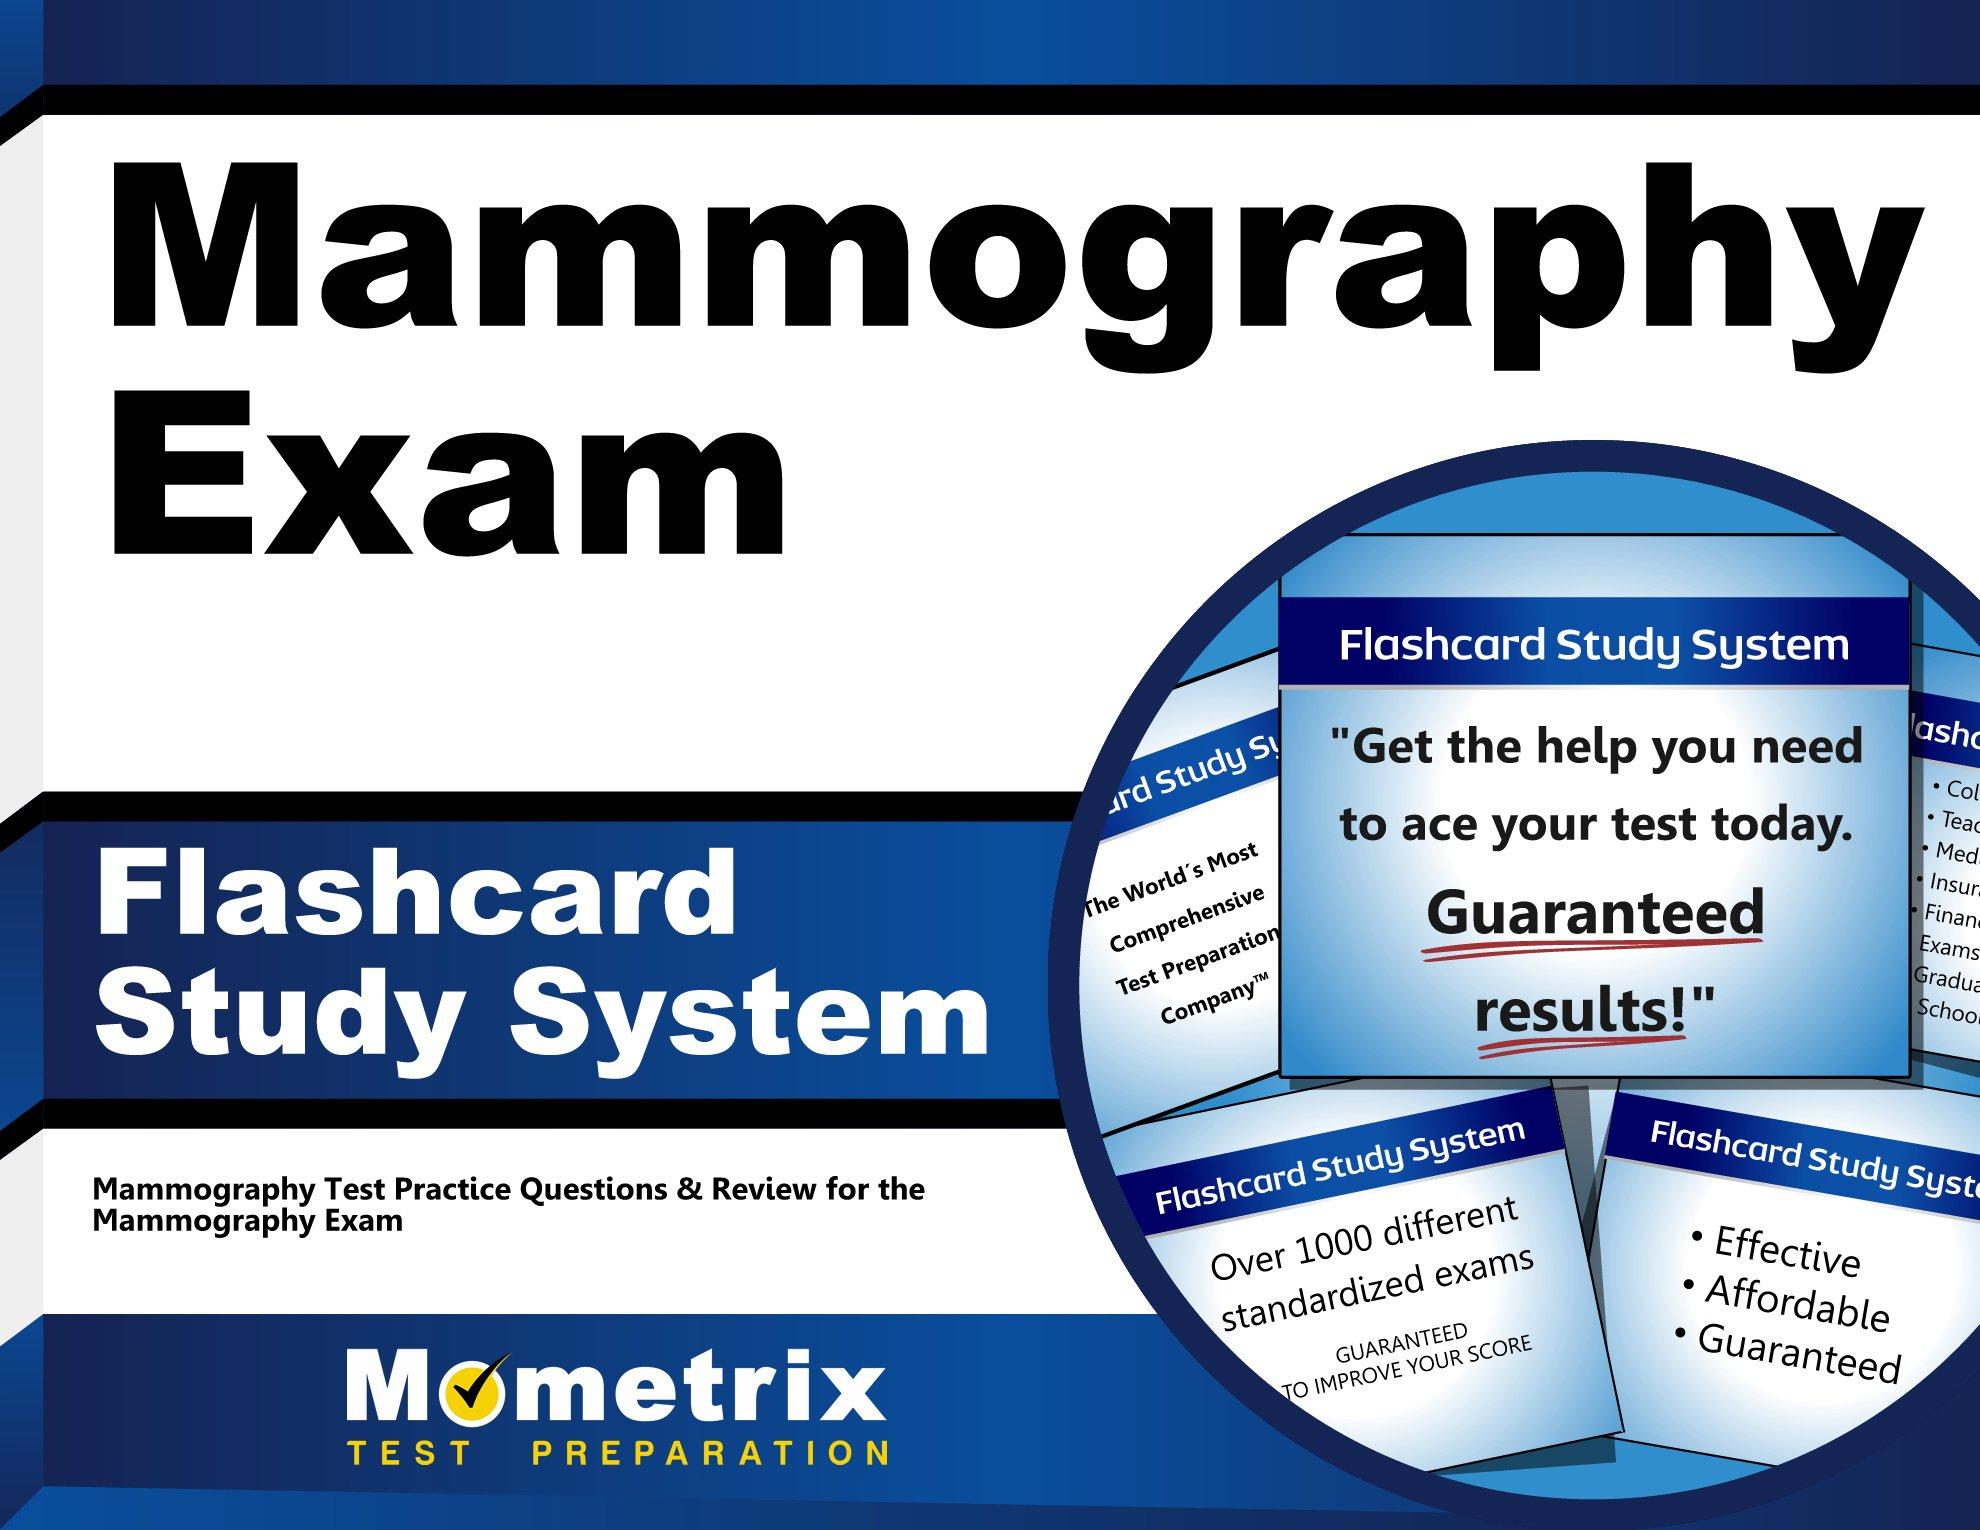 Mammography exam flashcard study system mammography test practice mammography exam flashcard study system mammography test practice questions review for the mammography exam cards mammography exam secrets test prep xflitez Gallery